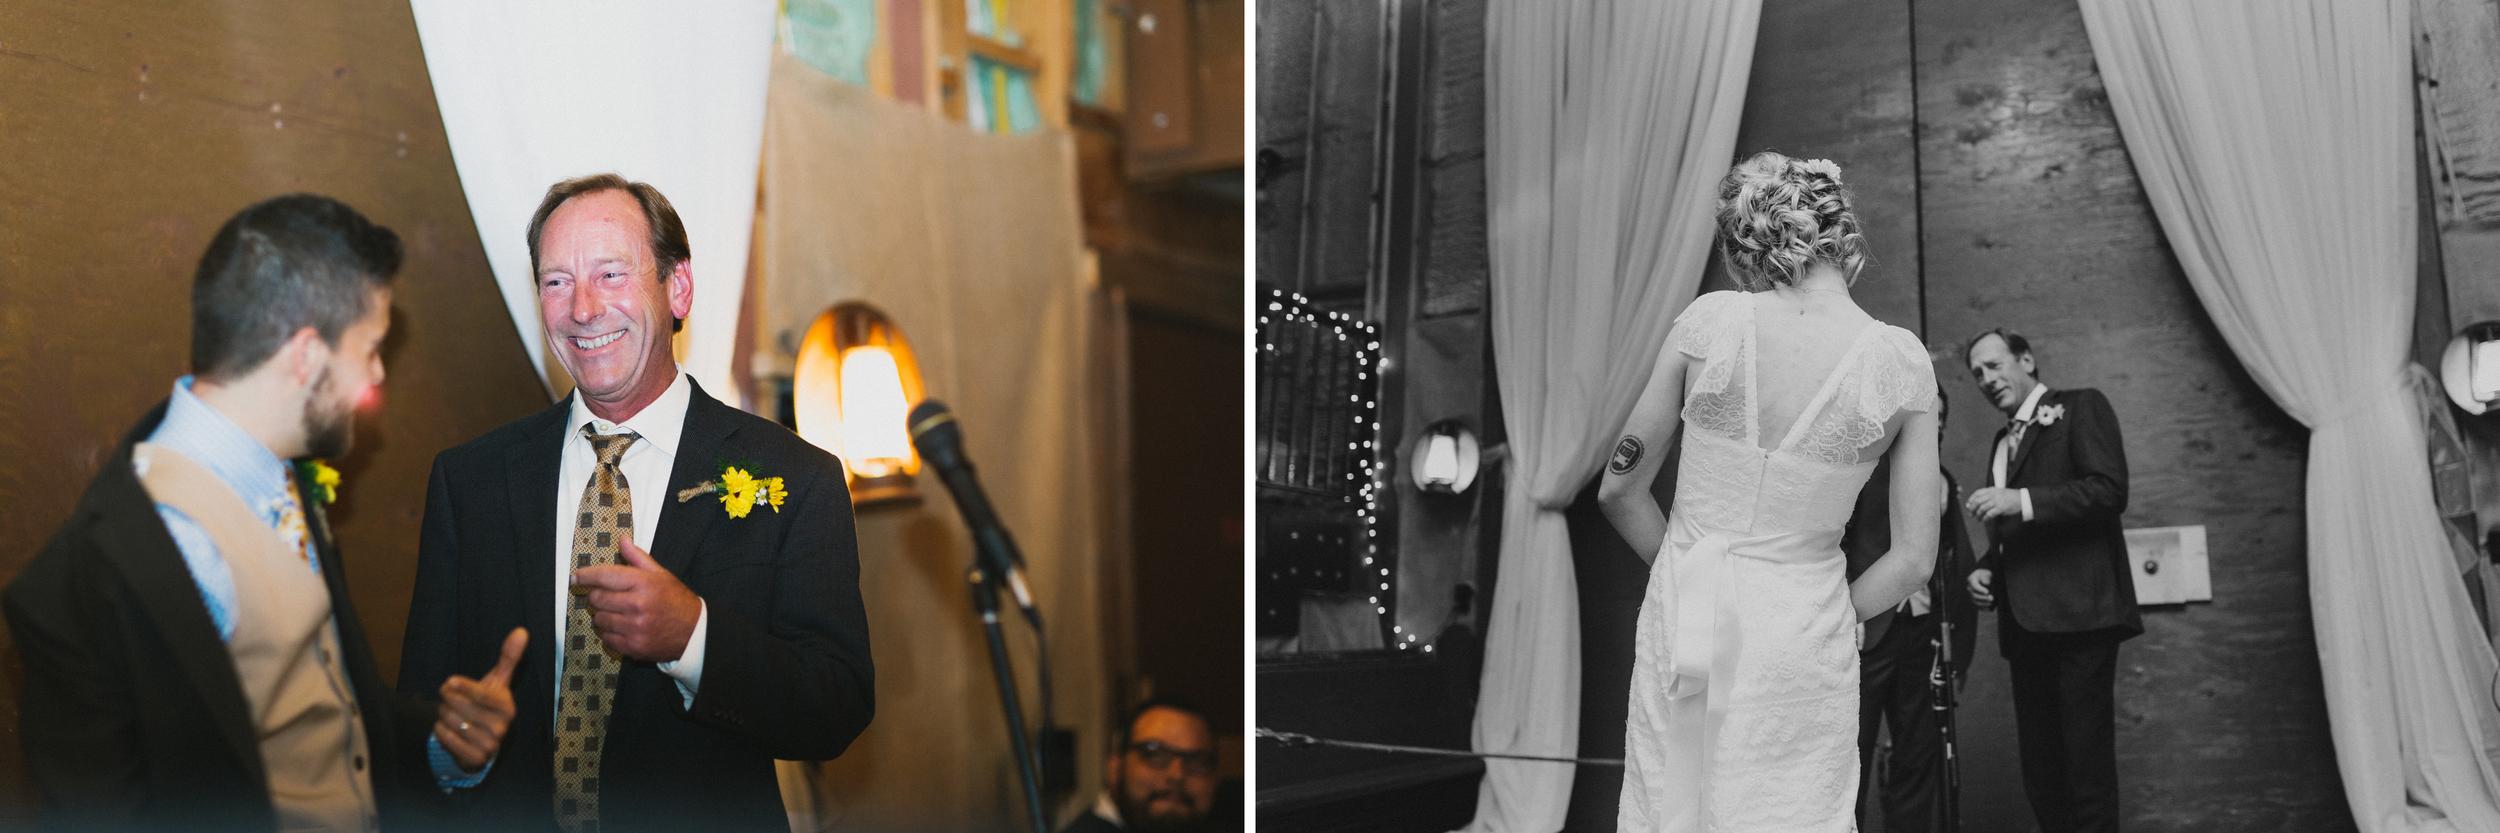 Salt-Lake-City-Wedding-Photographer-Utah-015.jpg